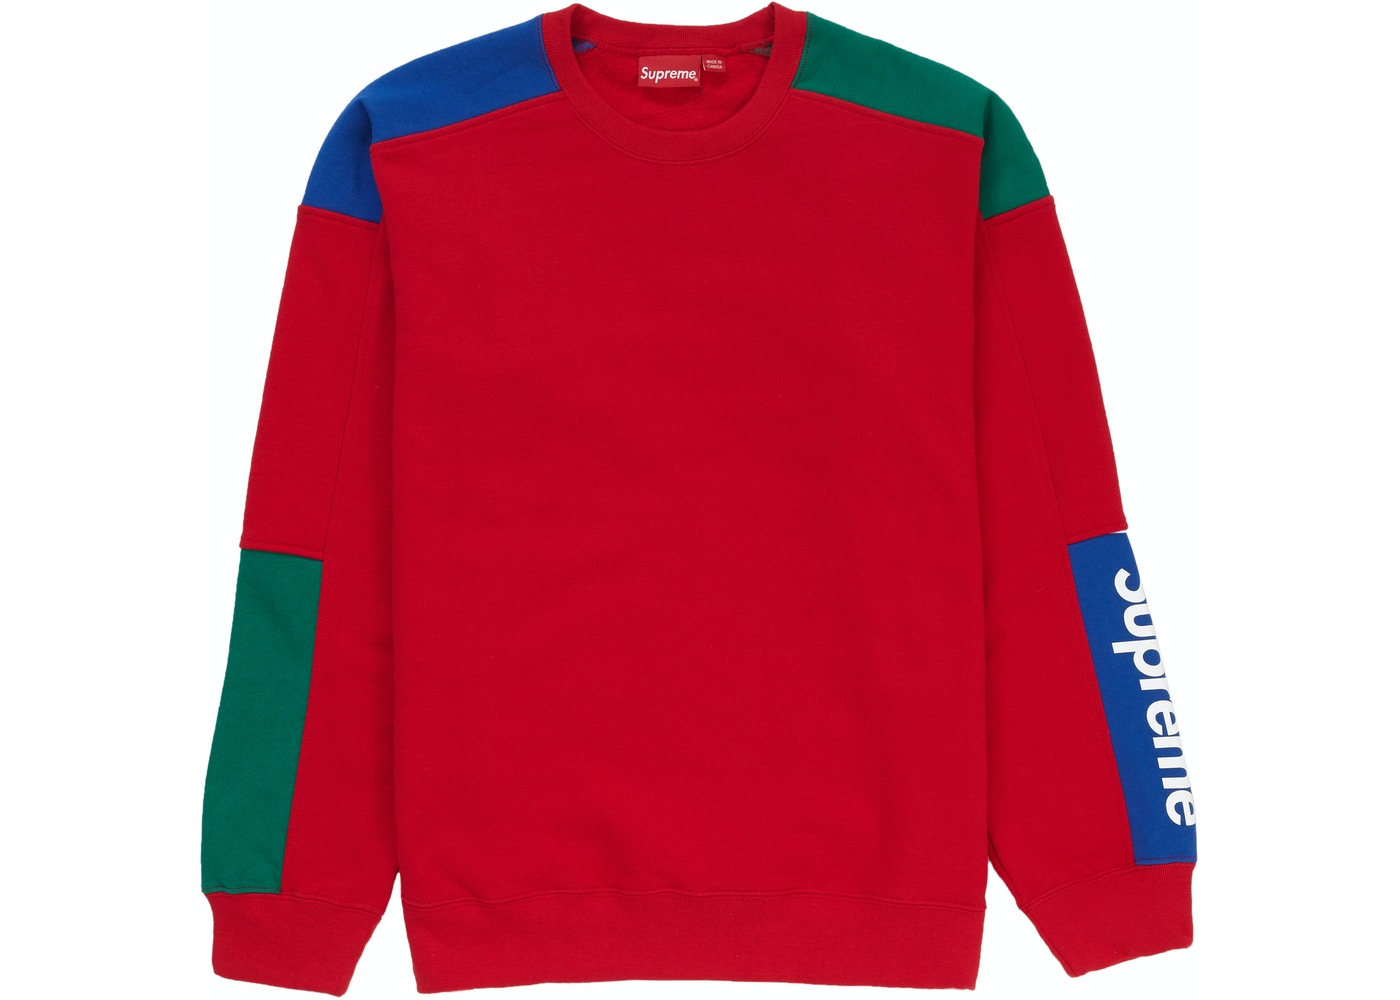 87f49a2b329a Supreme Tops Sweatshirts - Buy   Sell Streetwear